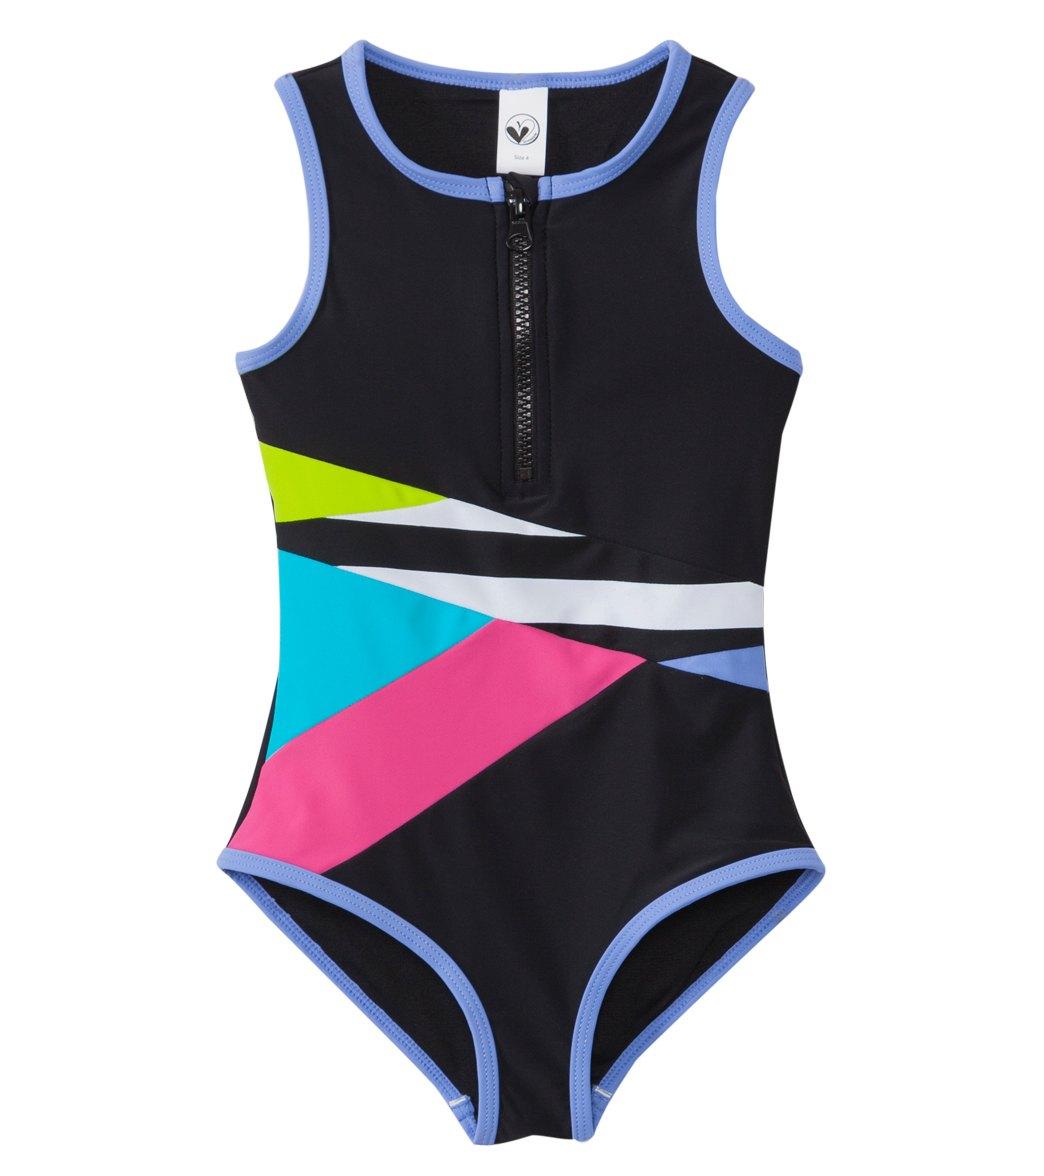 73069de150 Limeapple Swimwear Girls' Paradise Colorblock One Piece Swimsuit ...